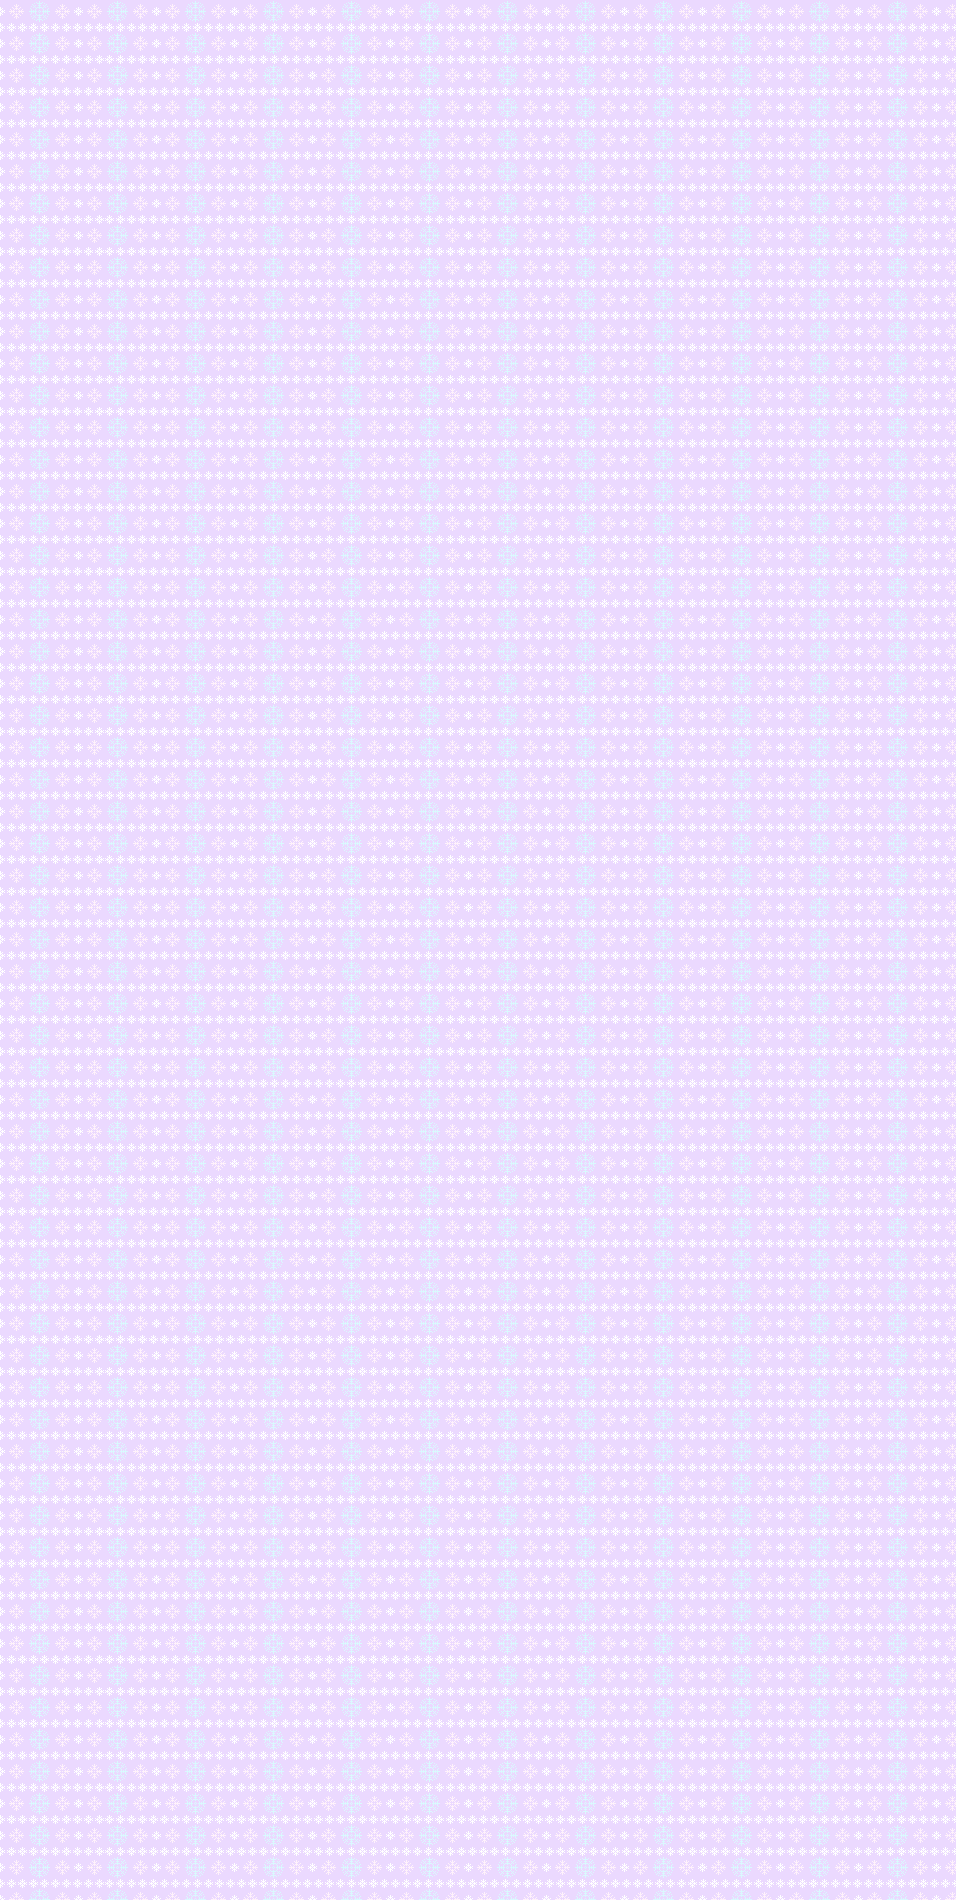 Free Pastel Purple Snowflakes Custom Box BG by cottoncritter